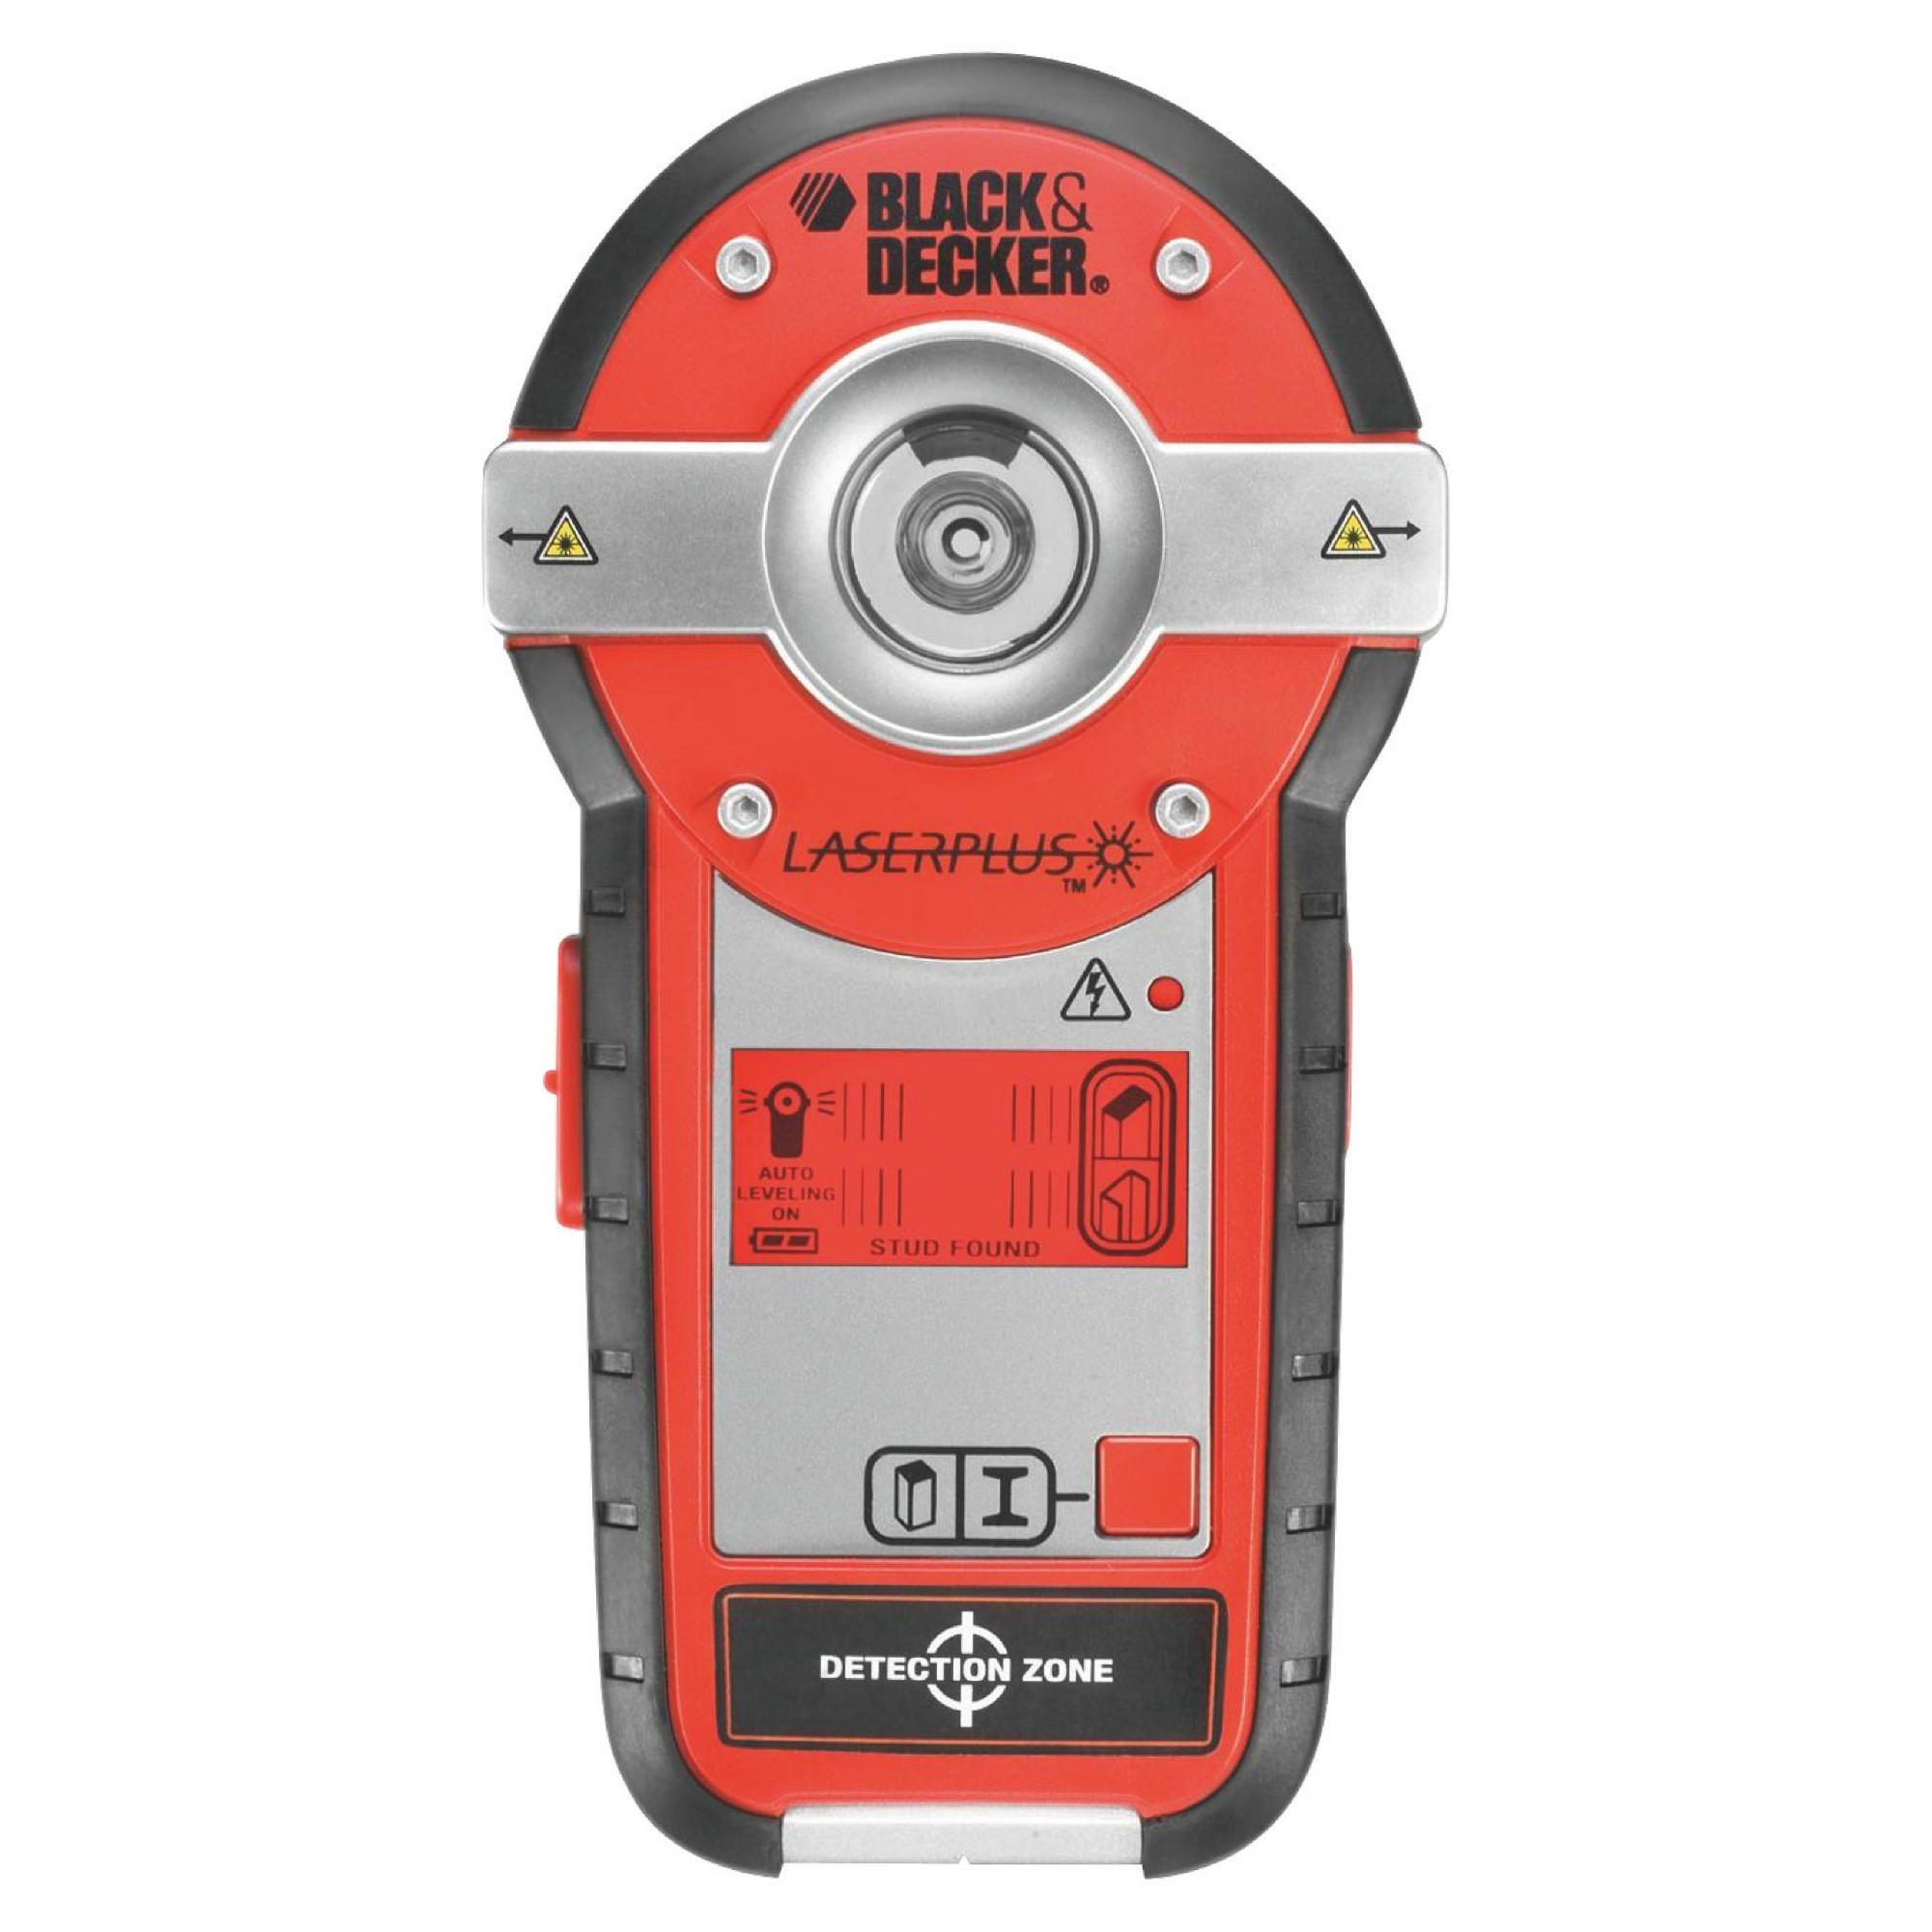 Laser levels spirit levels bosch pll 360 self levelling for Laser bosch pll 360